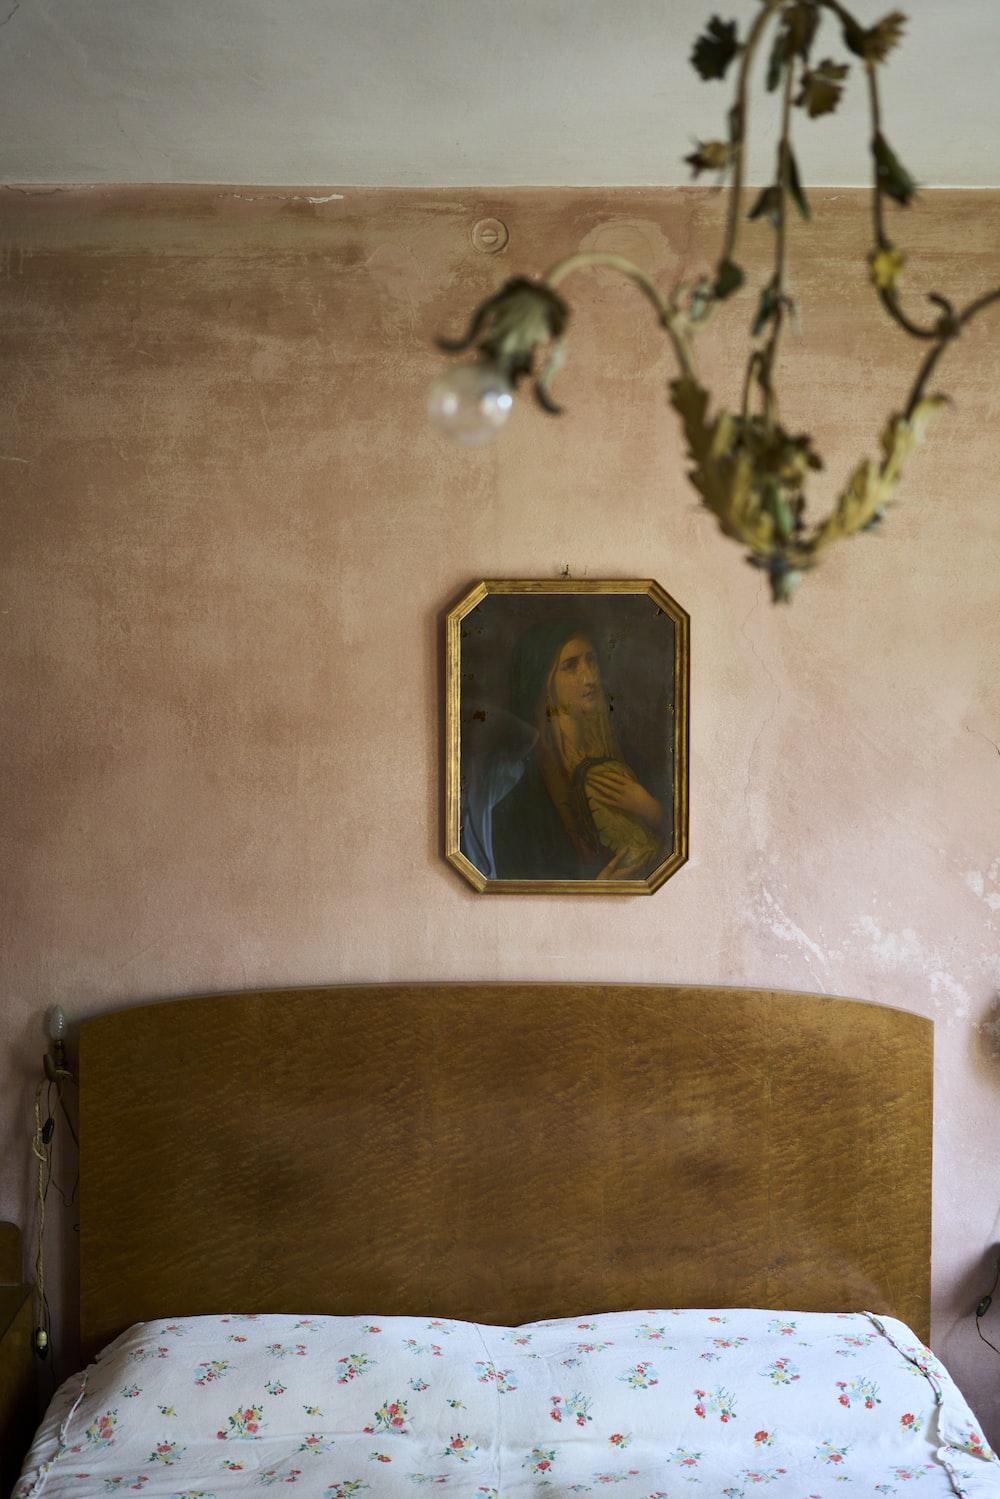 brown wooden framed painting of jesus christ